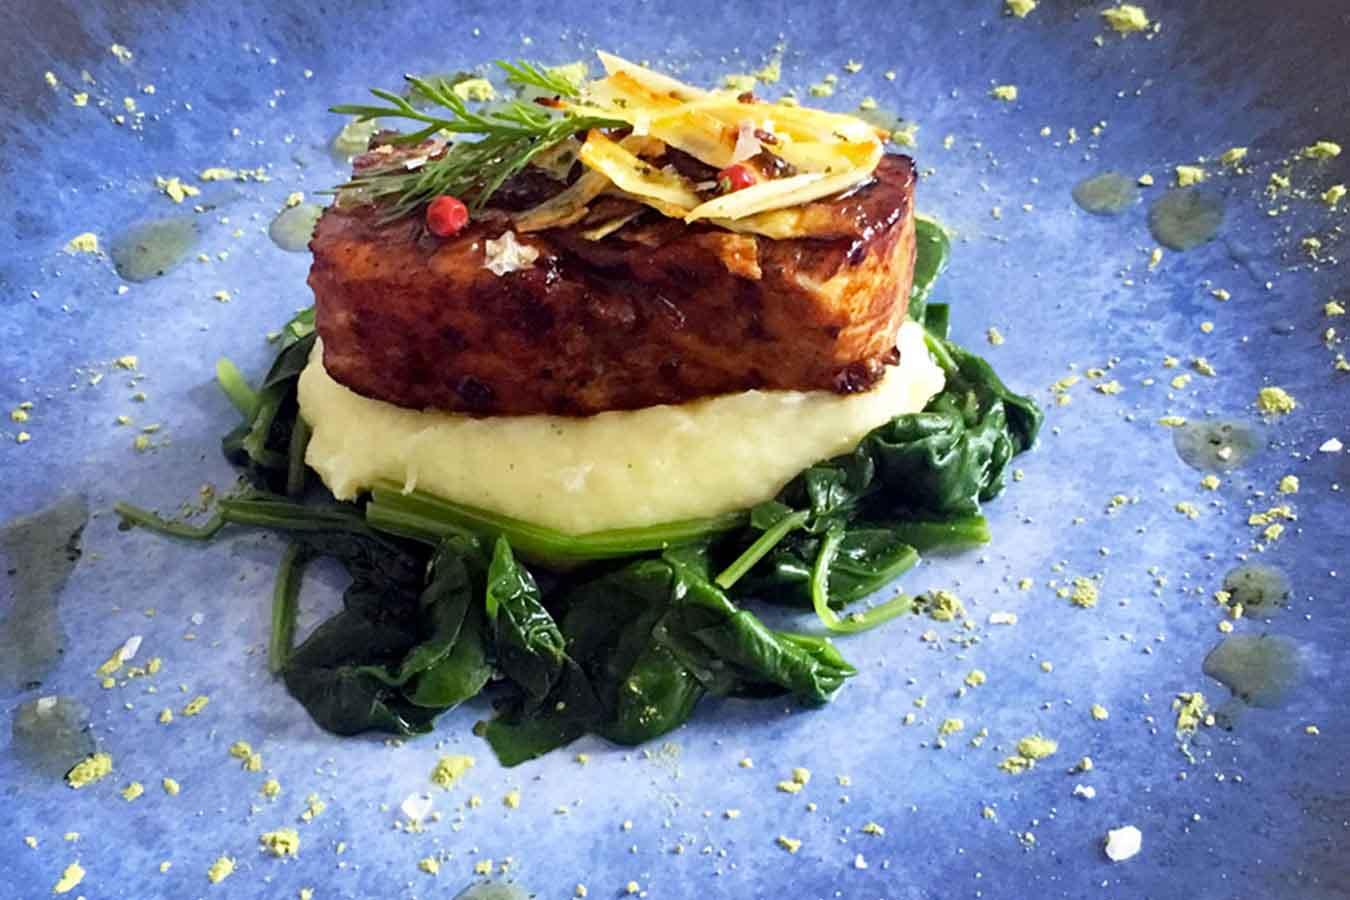 Salmone al tamarindo, pastinaca e spinaci